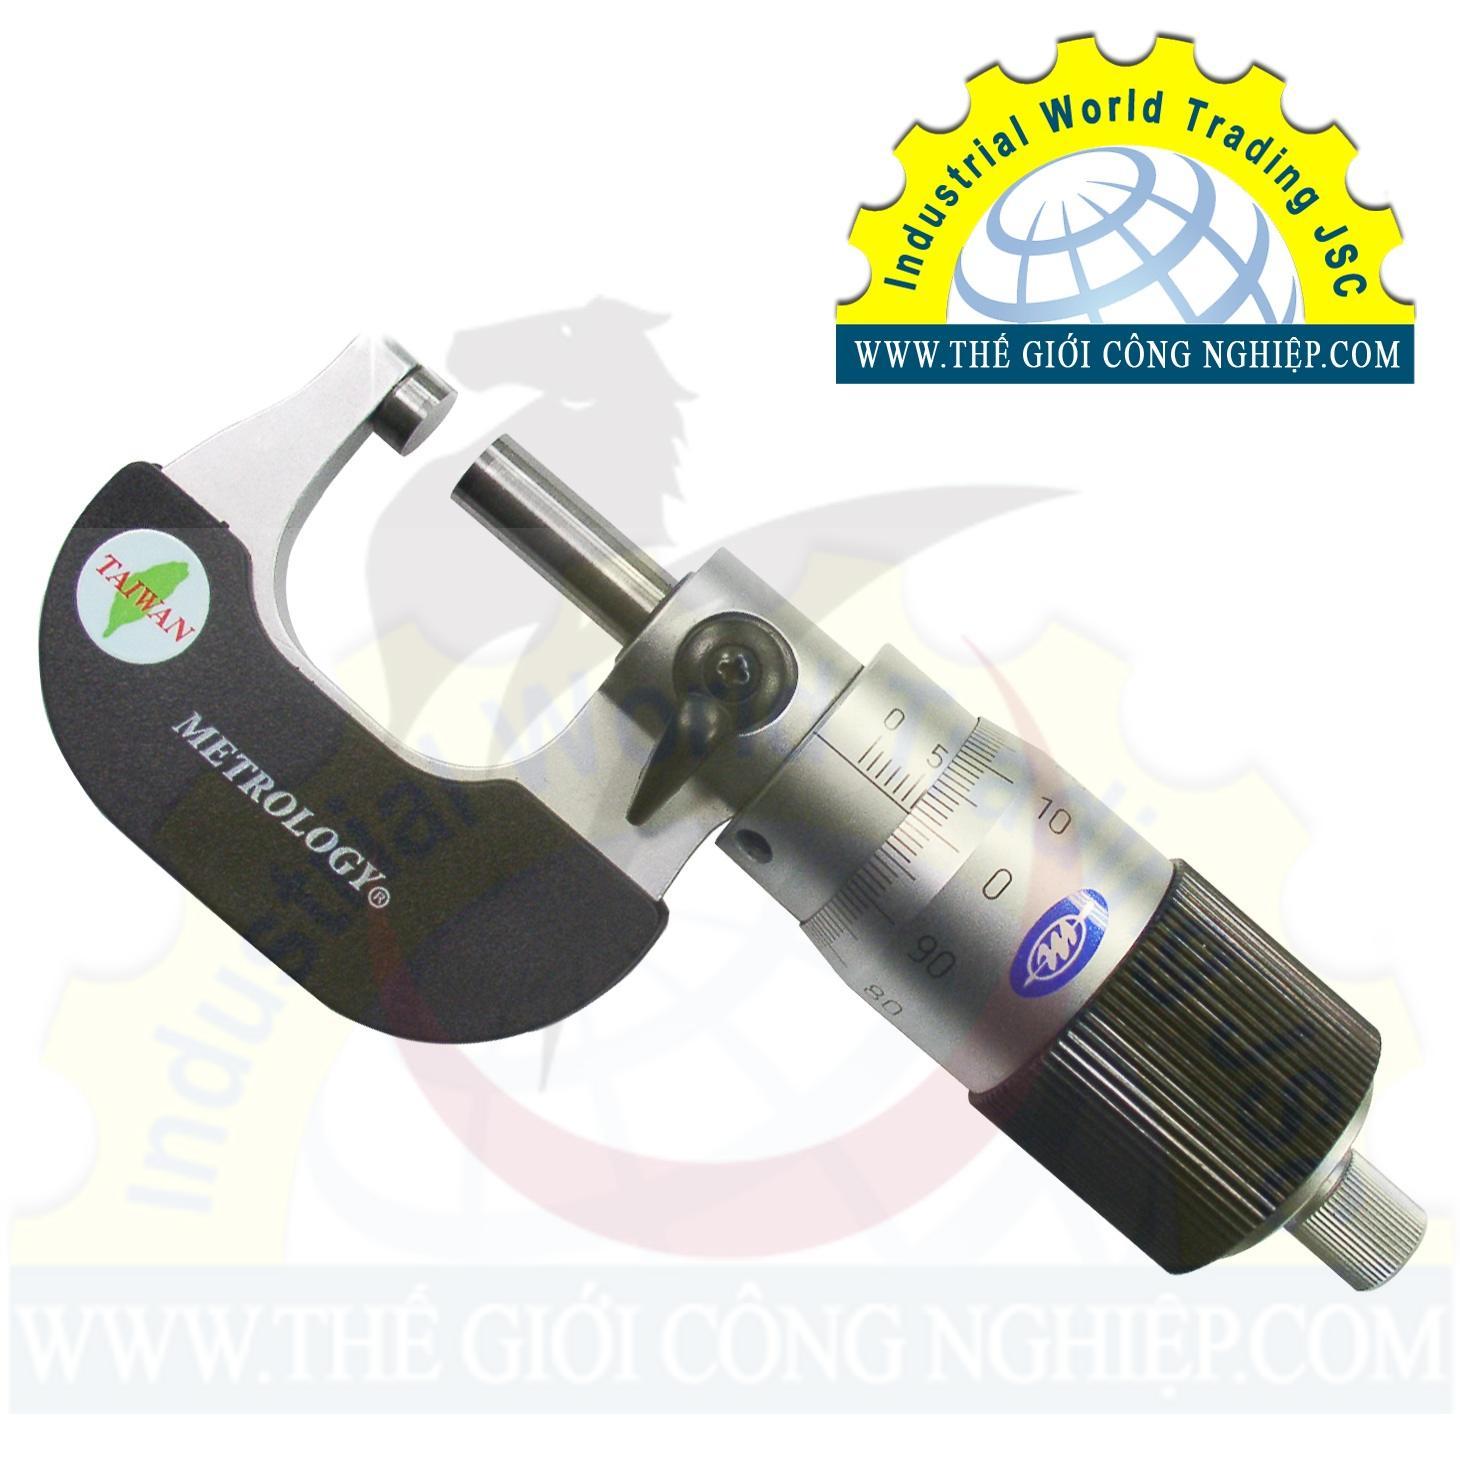 Outside Micrometer (100 Step Graduation) 50-75mm OM-9028 Metrology